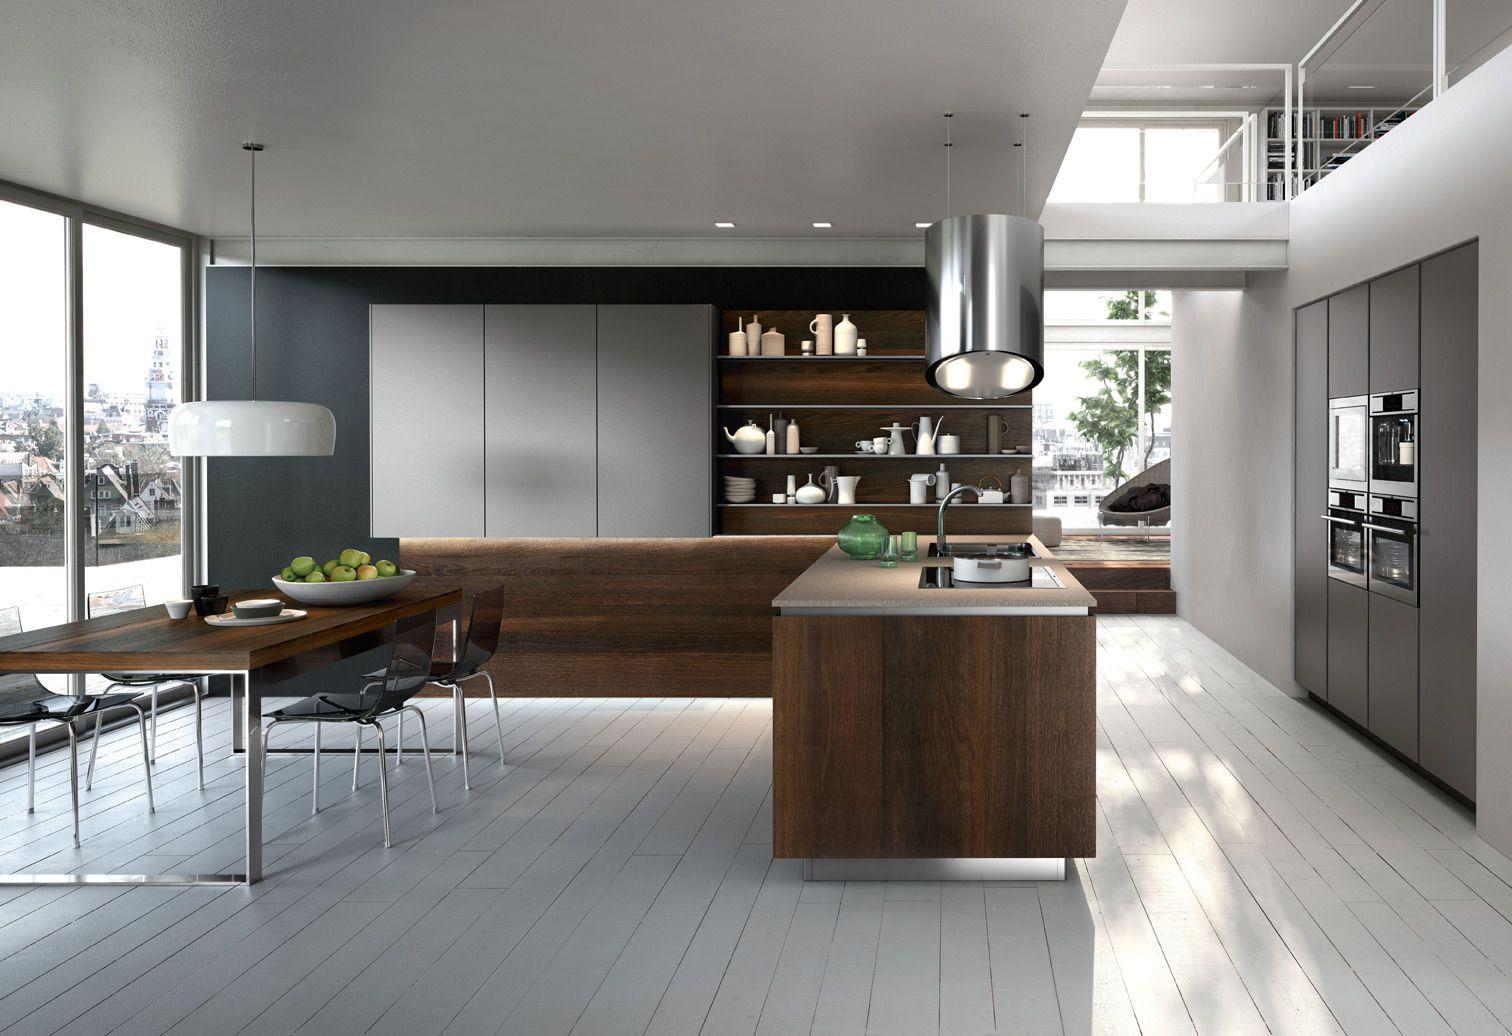 Italian Kitchens Snaidero Kitchen Decor Modern Modern Kitchen Design Kitchen Cabinet Styles